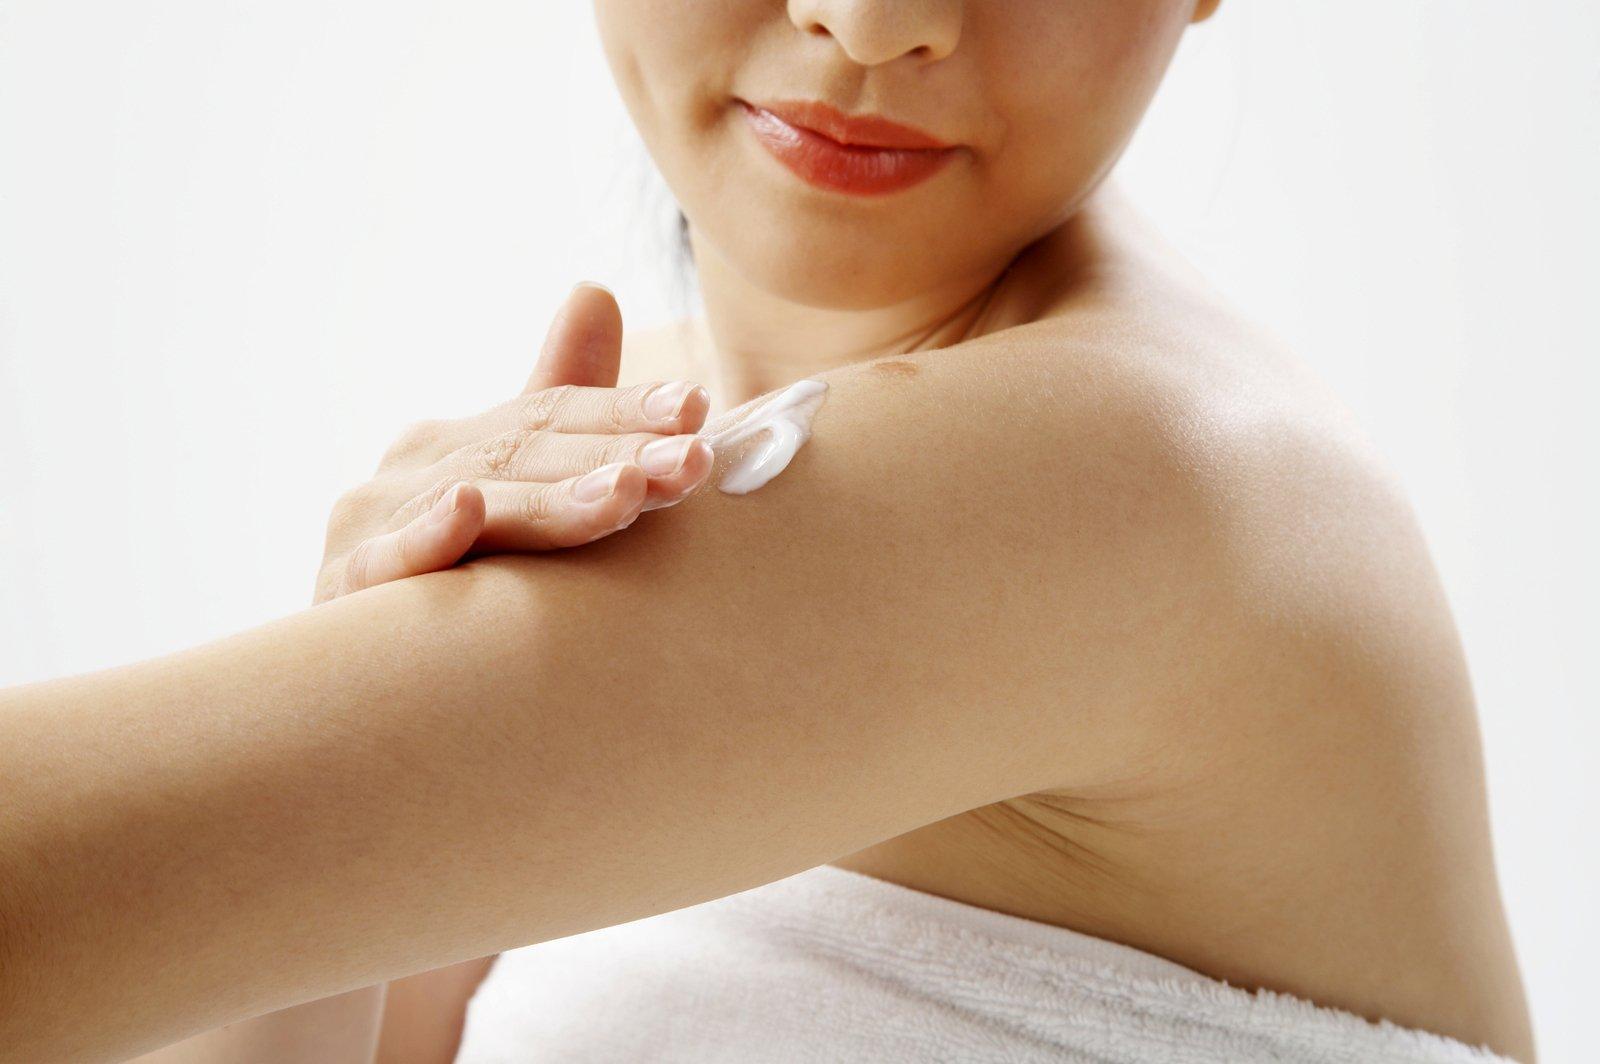 beauty regimen, safe skincare products